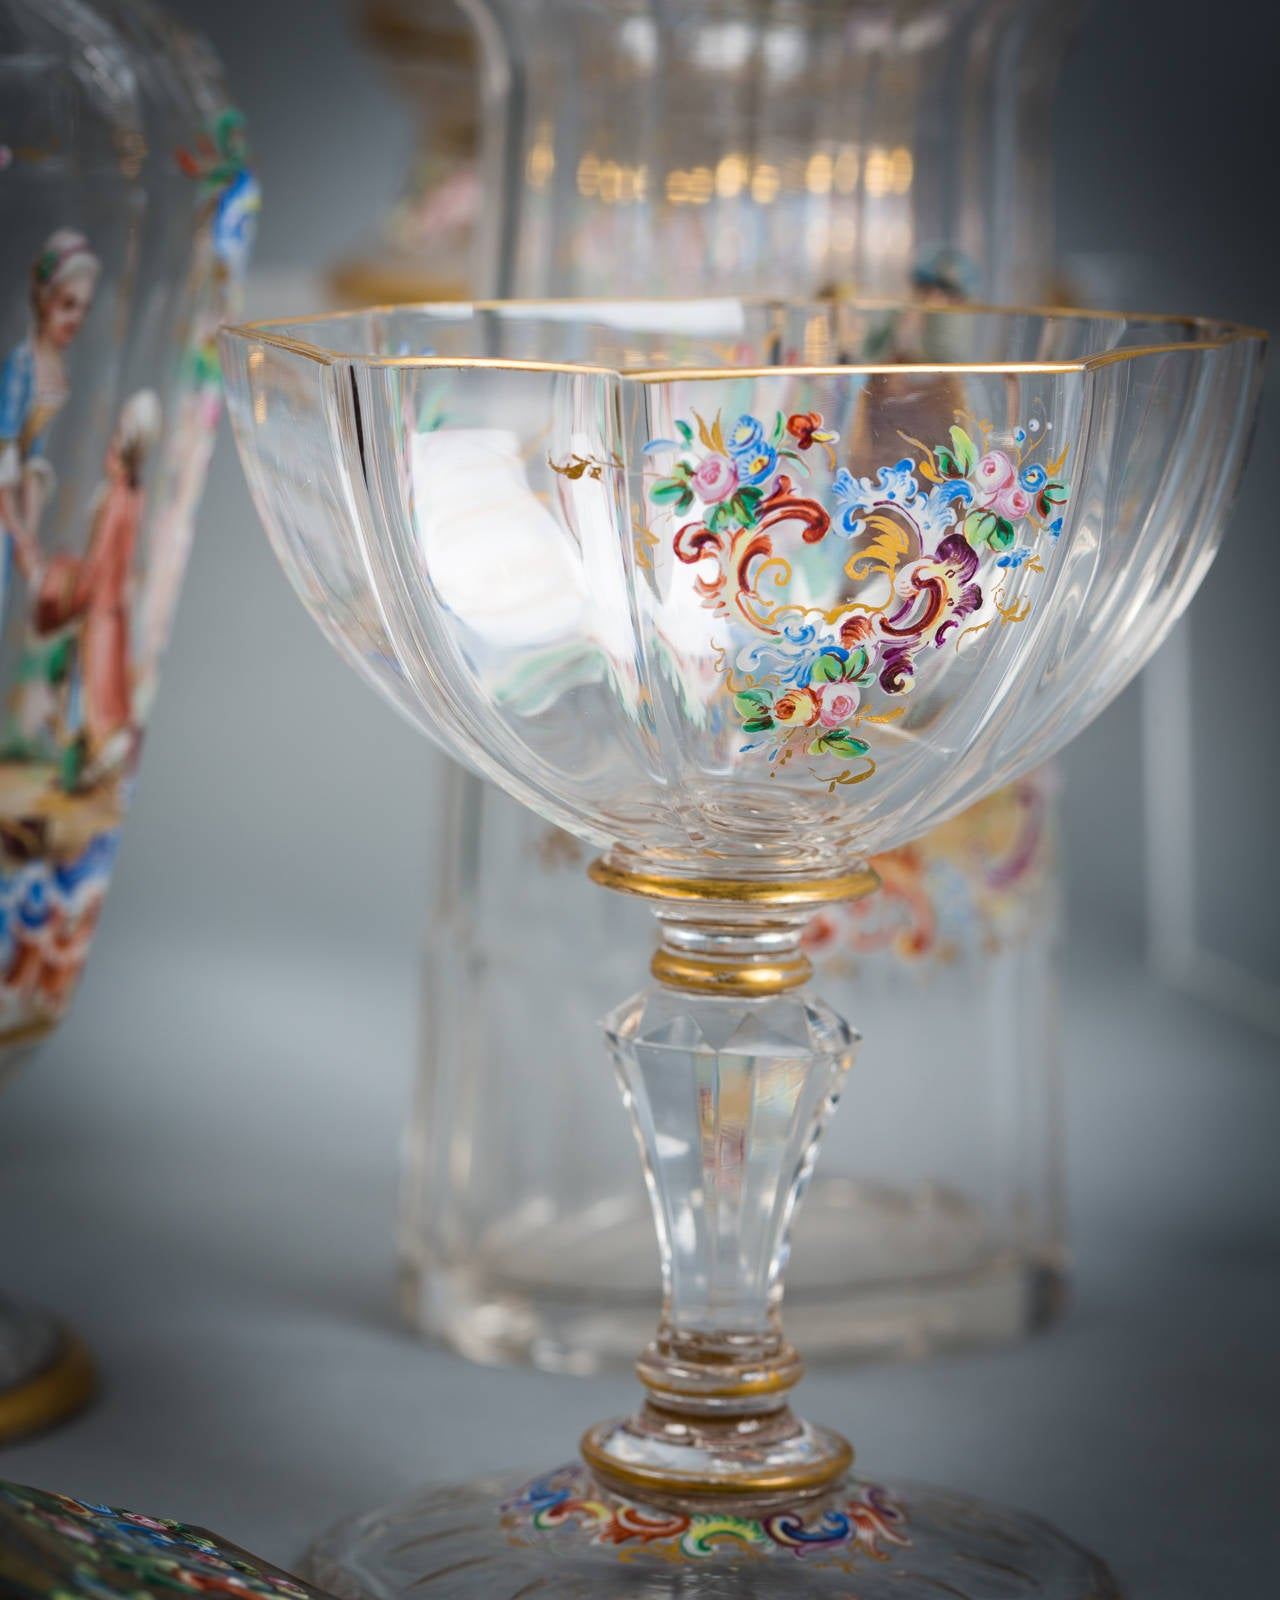 19th Century Austrian Enamel Table Glassware, Lobmeyr, circa 1890 For Sale